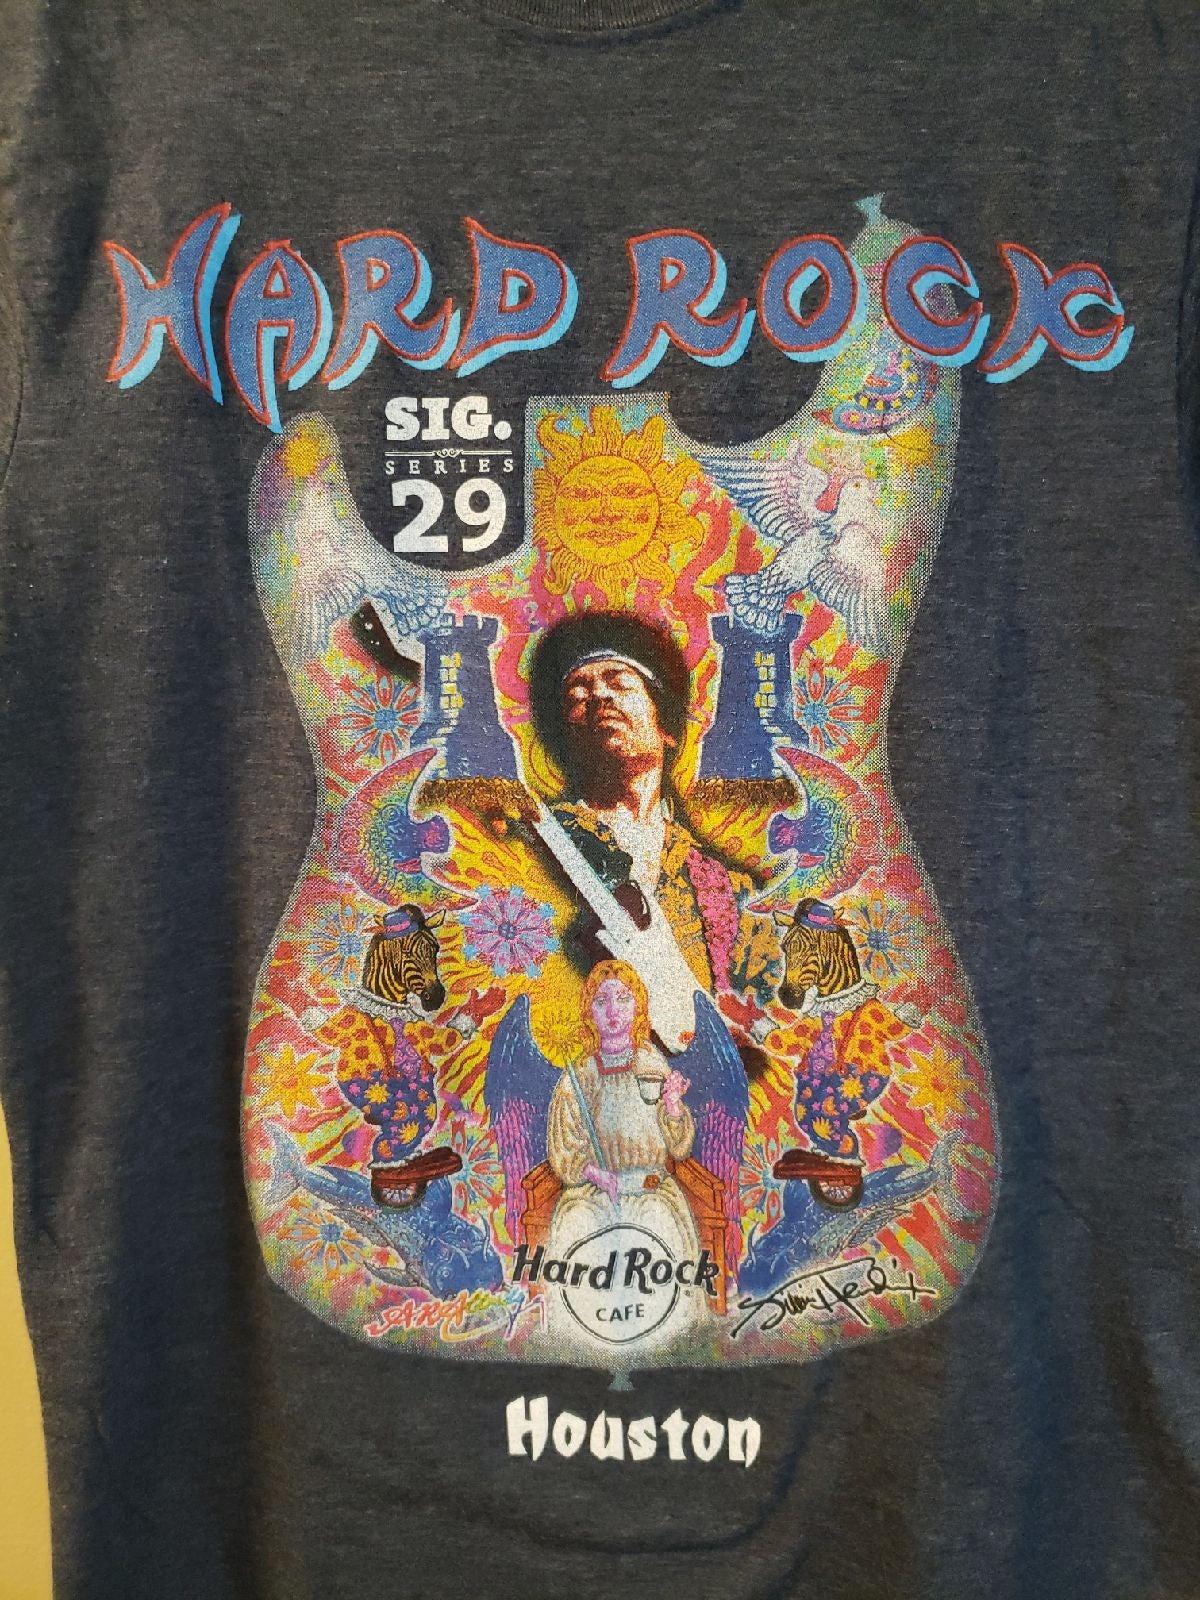 Hard Rock Cafe jimi hendrix graphic tee